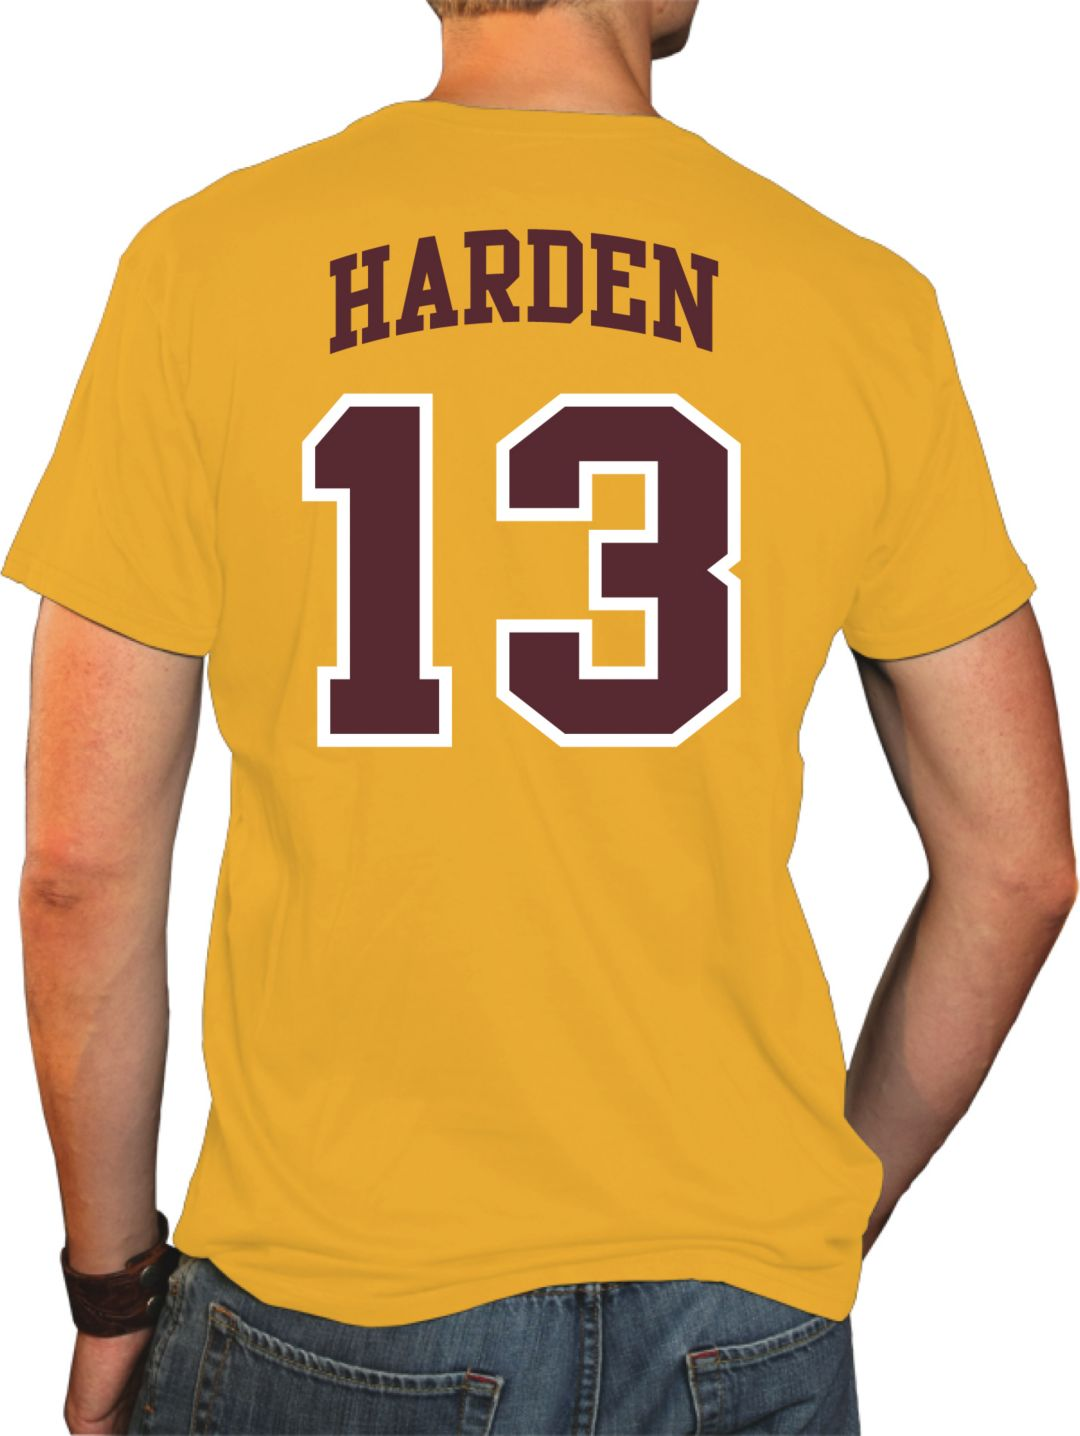 the latest 9b43b ec5ee Original Retro Brand Men's Arizona State Sun Devils James Harden #13 Gold  Basketball Jersey T-Shirt